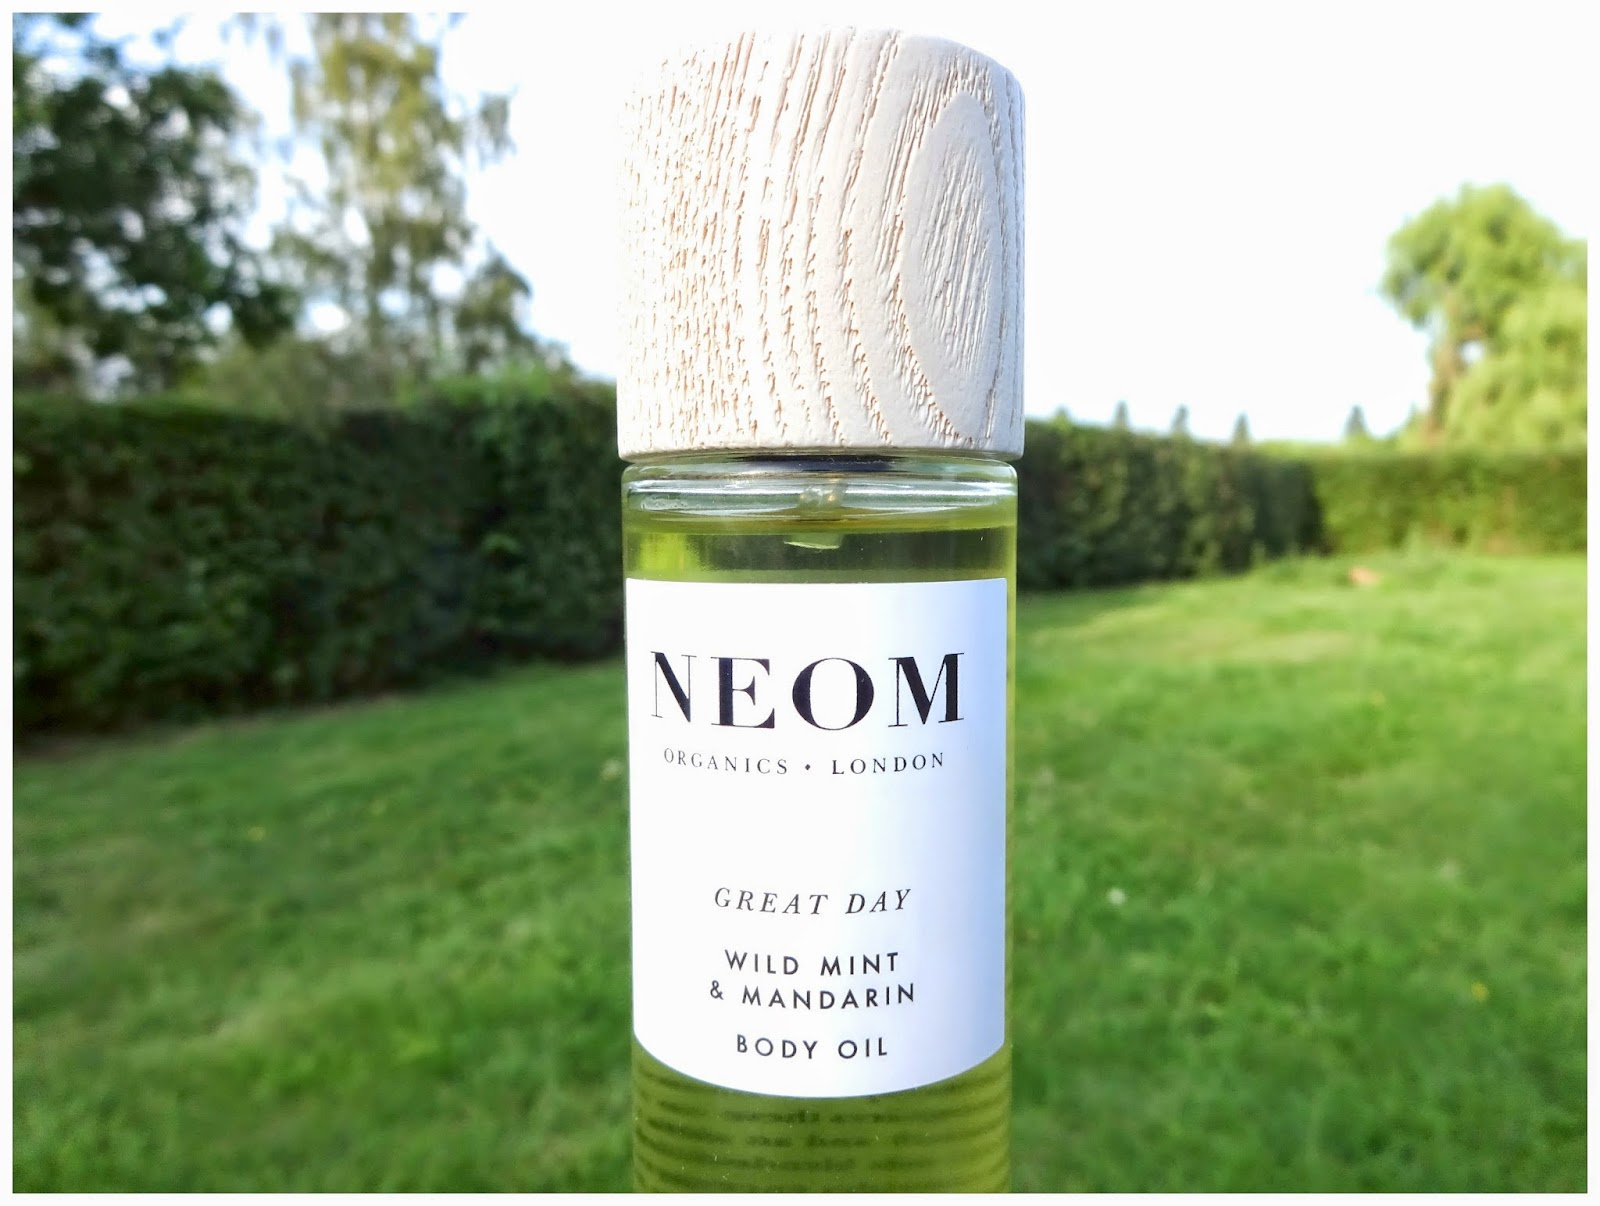 Neom organics swatch